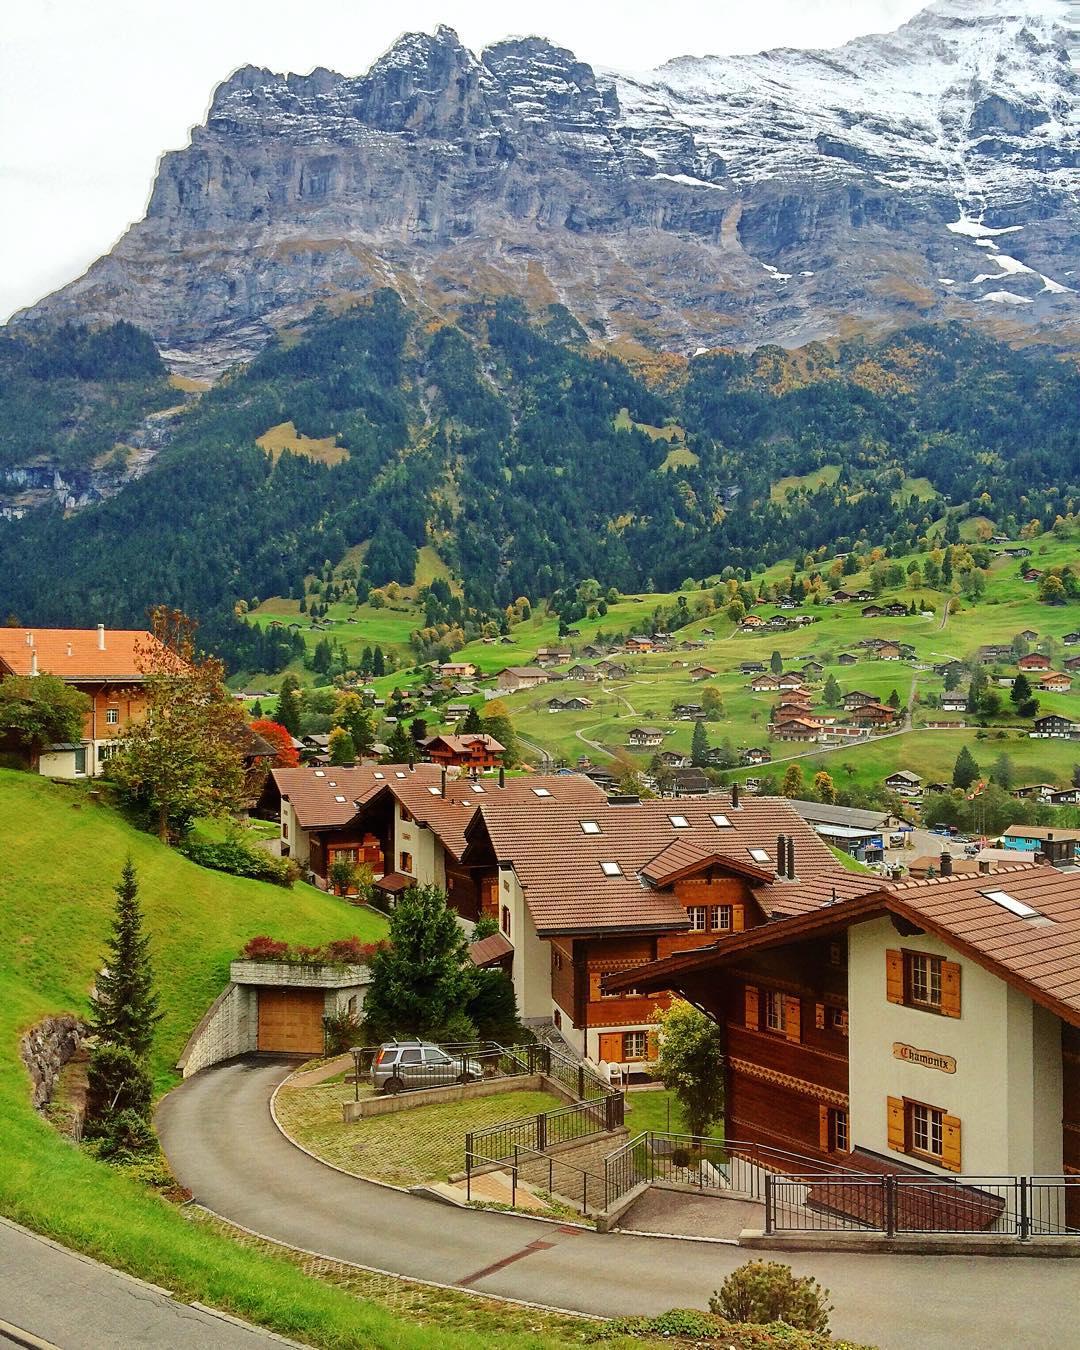 grindelwald vila alpina suica